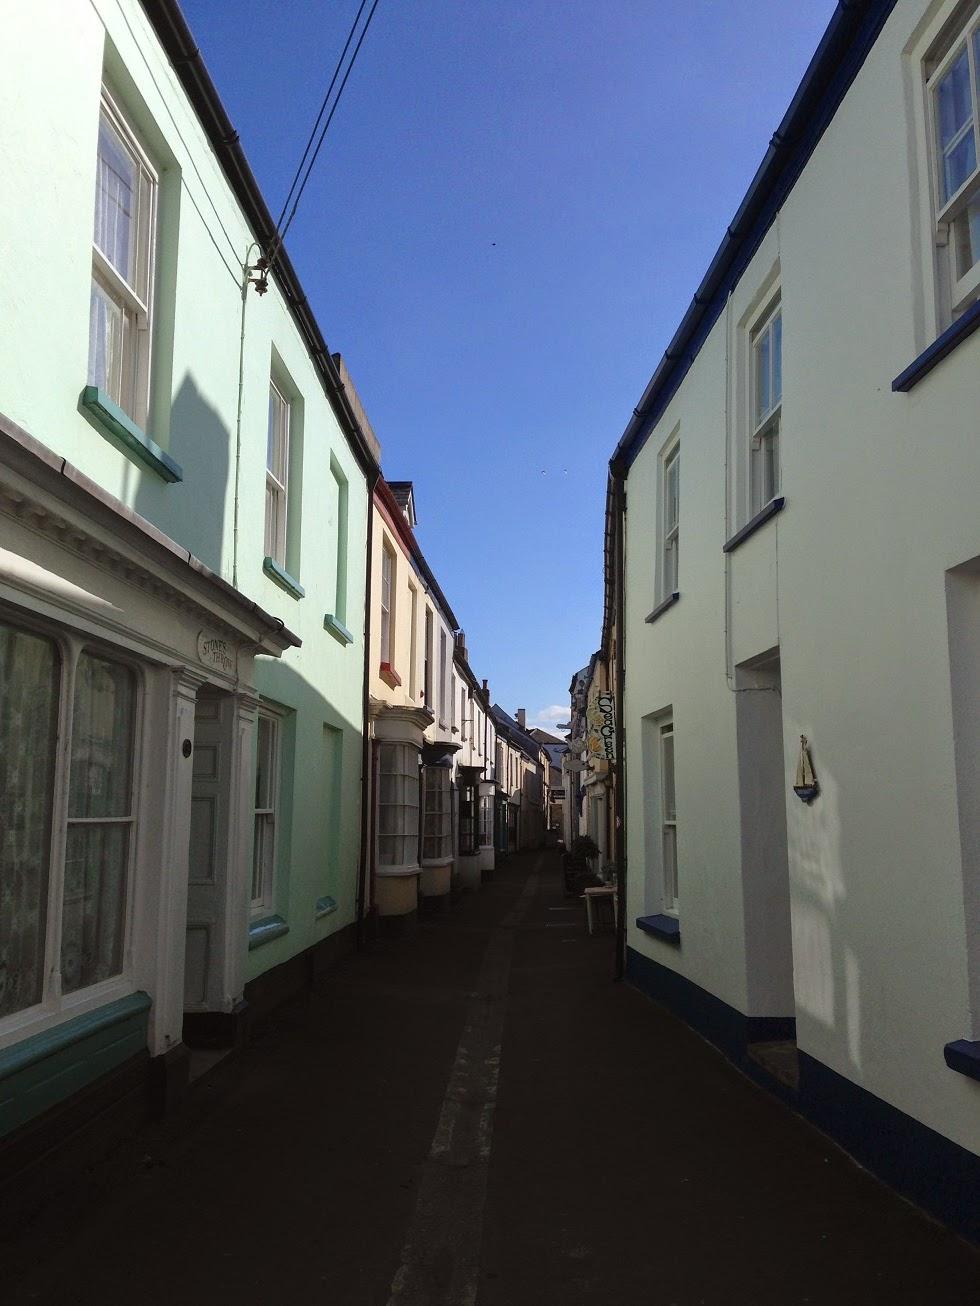 Narrow streets, Appledore, Devon